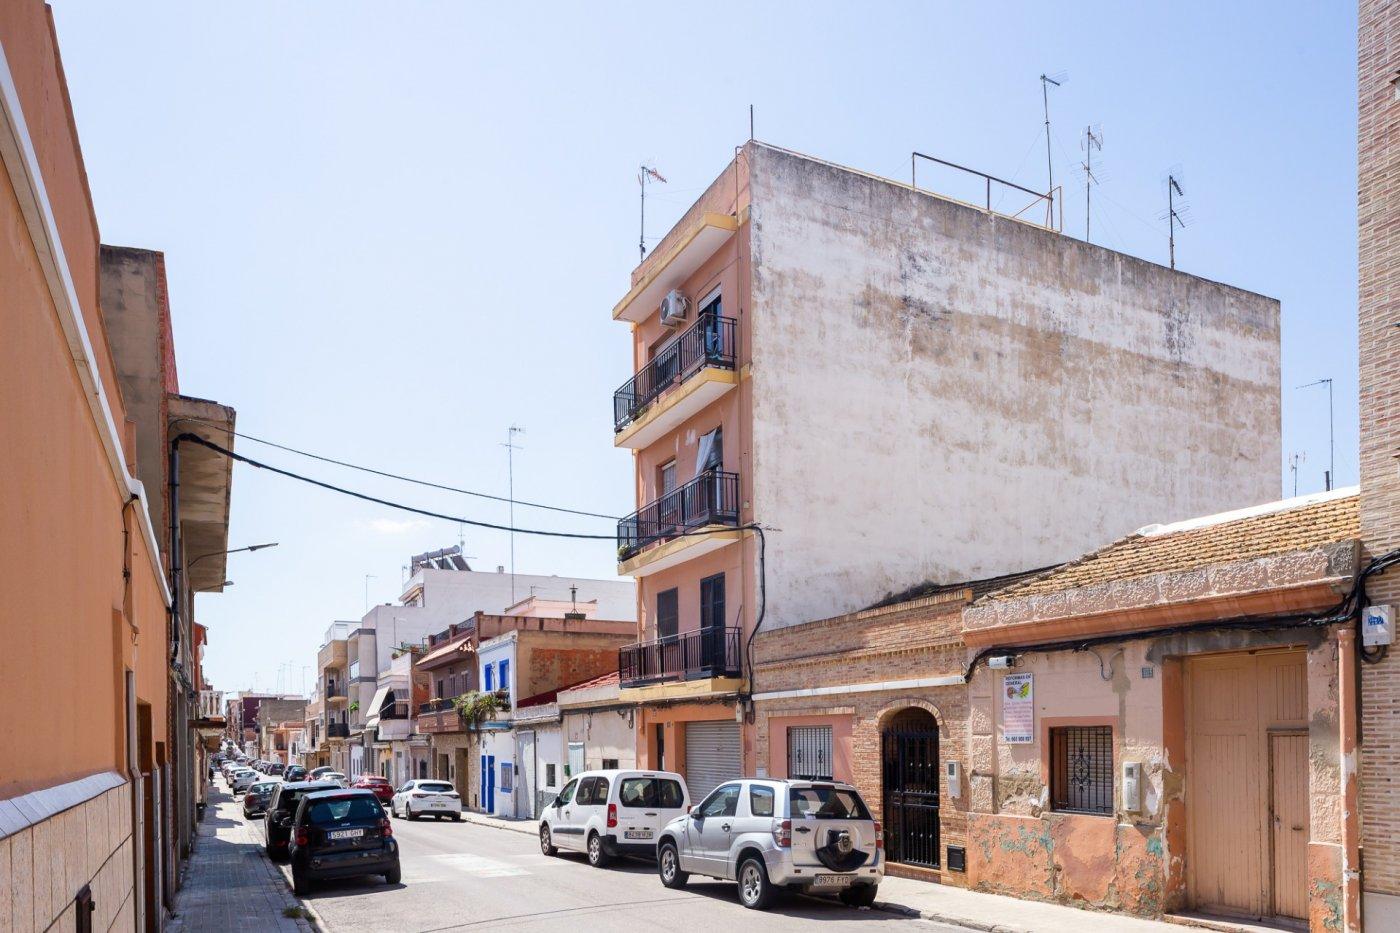 Edifici  Burjassot ,pza. concordia. Edificio de tres plantas con terraza